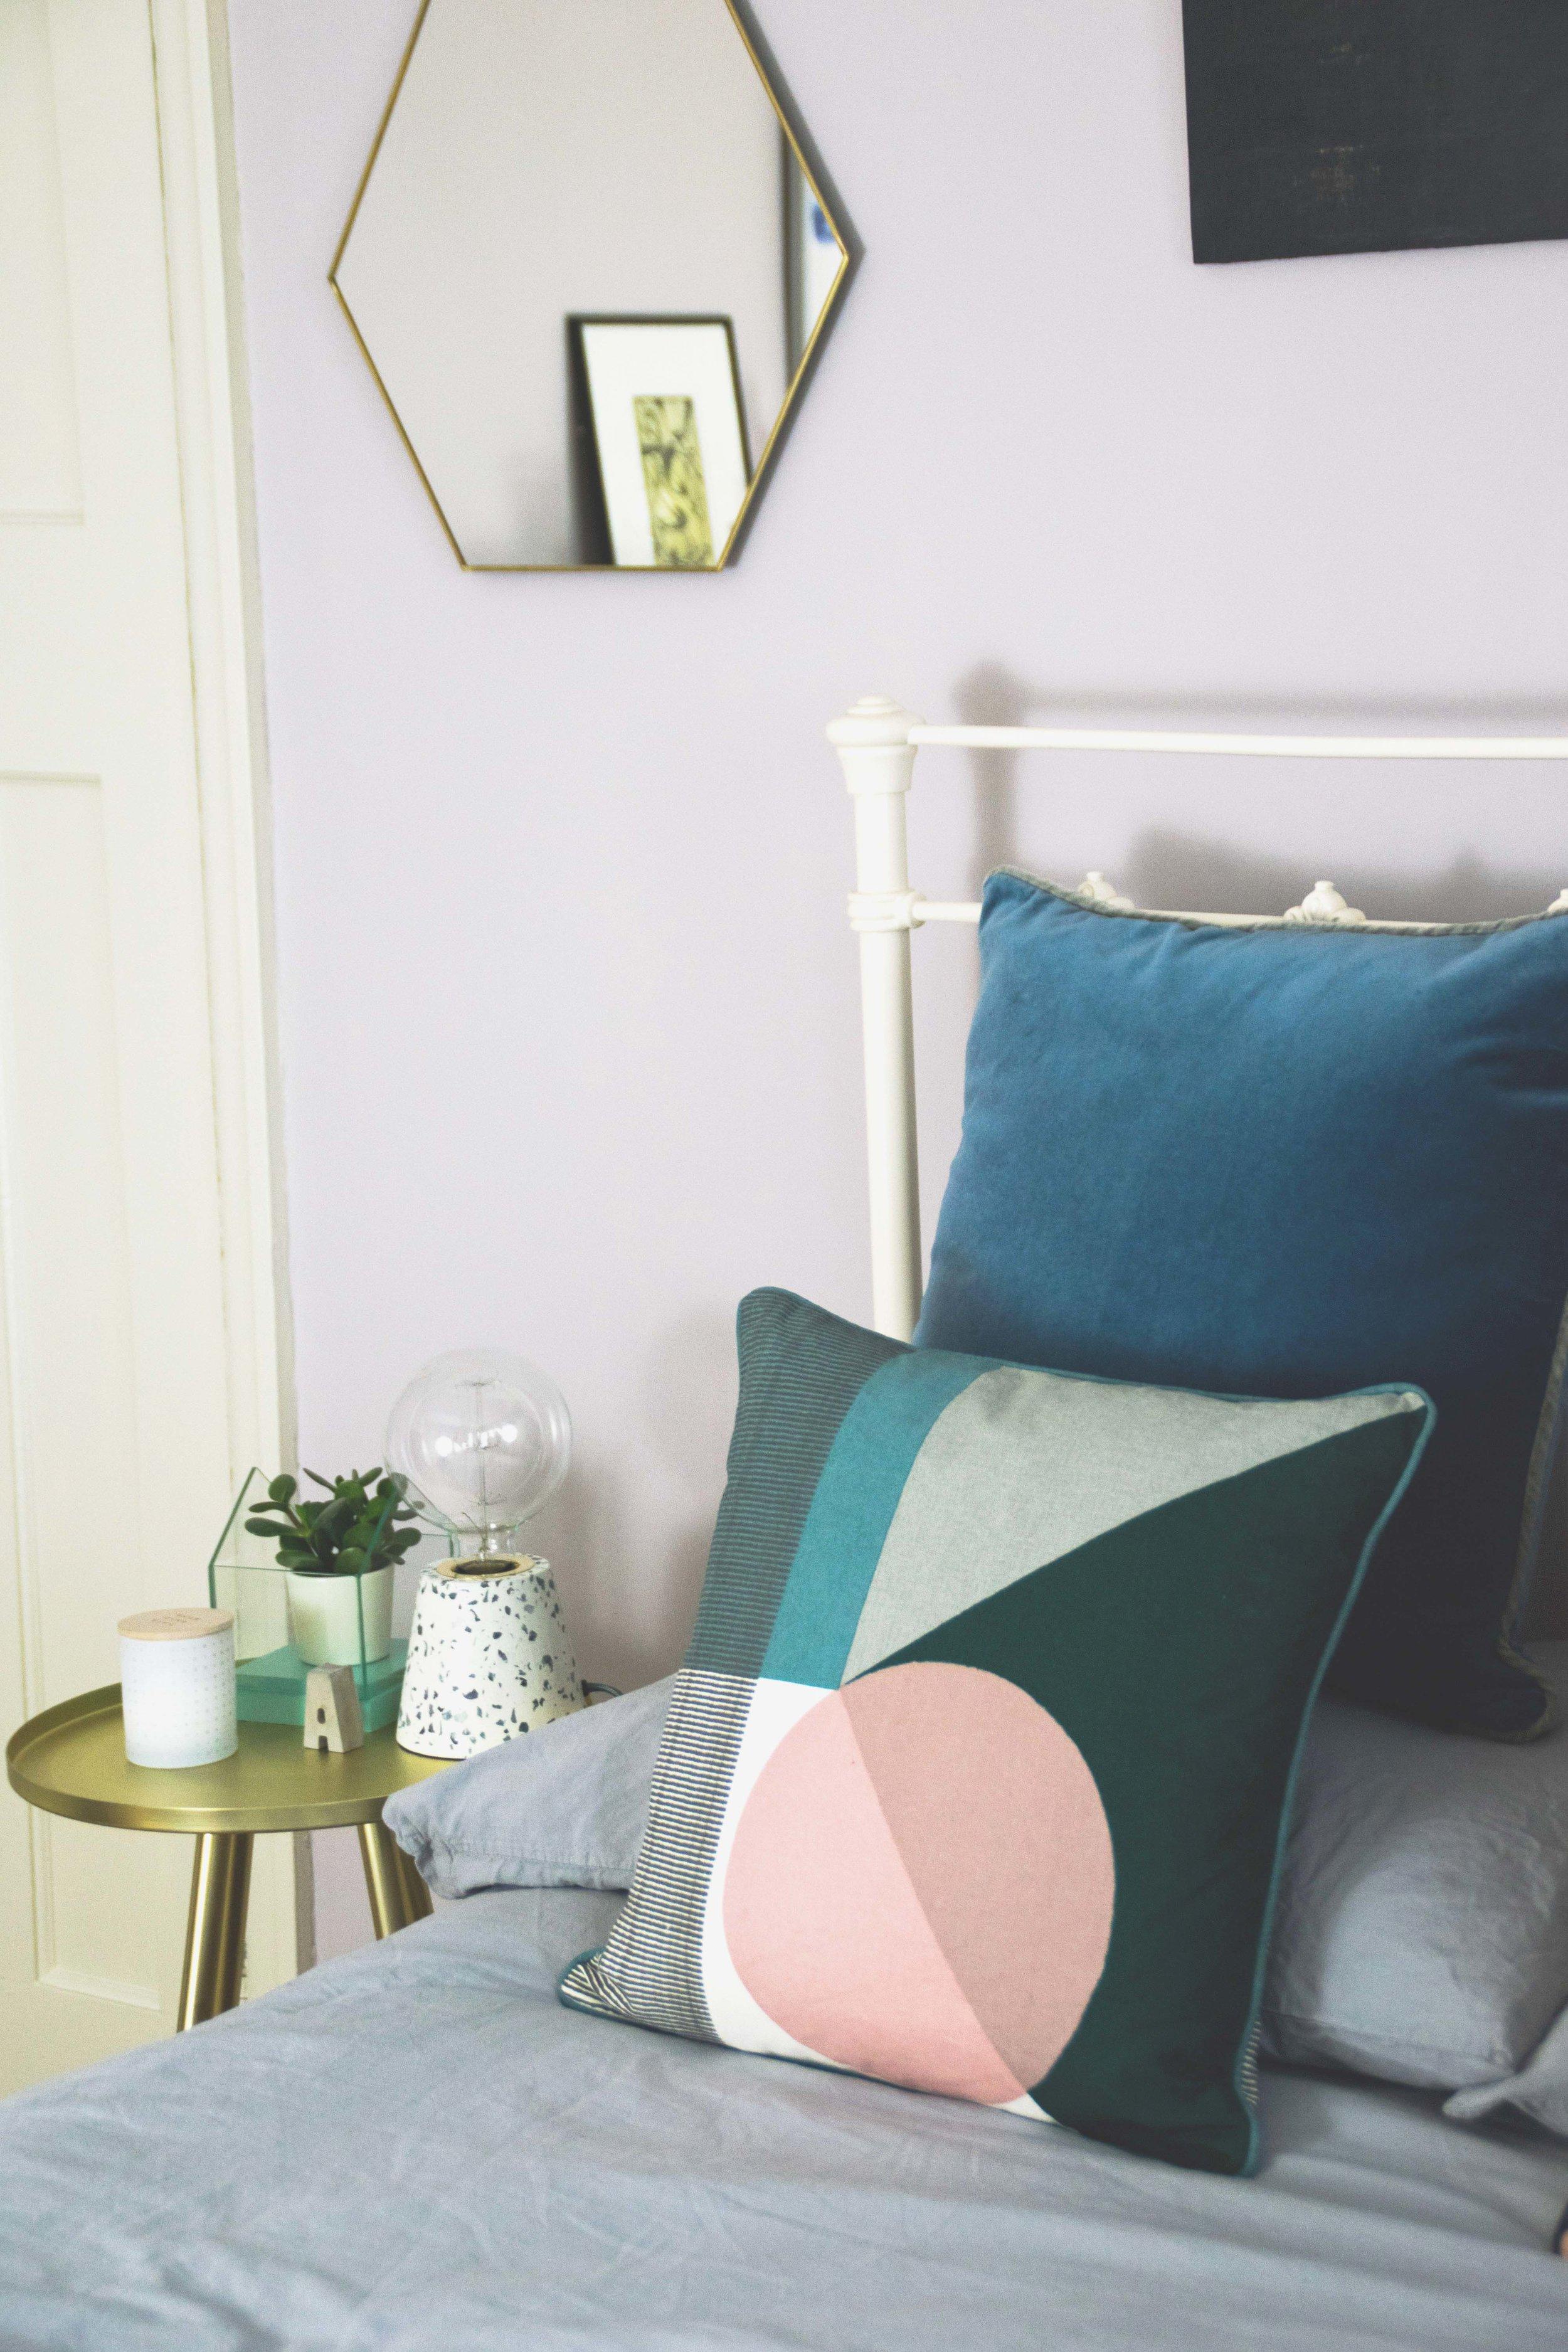 Interior Intake Bedroom Bed & Table.jpg